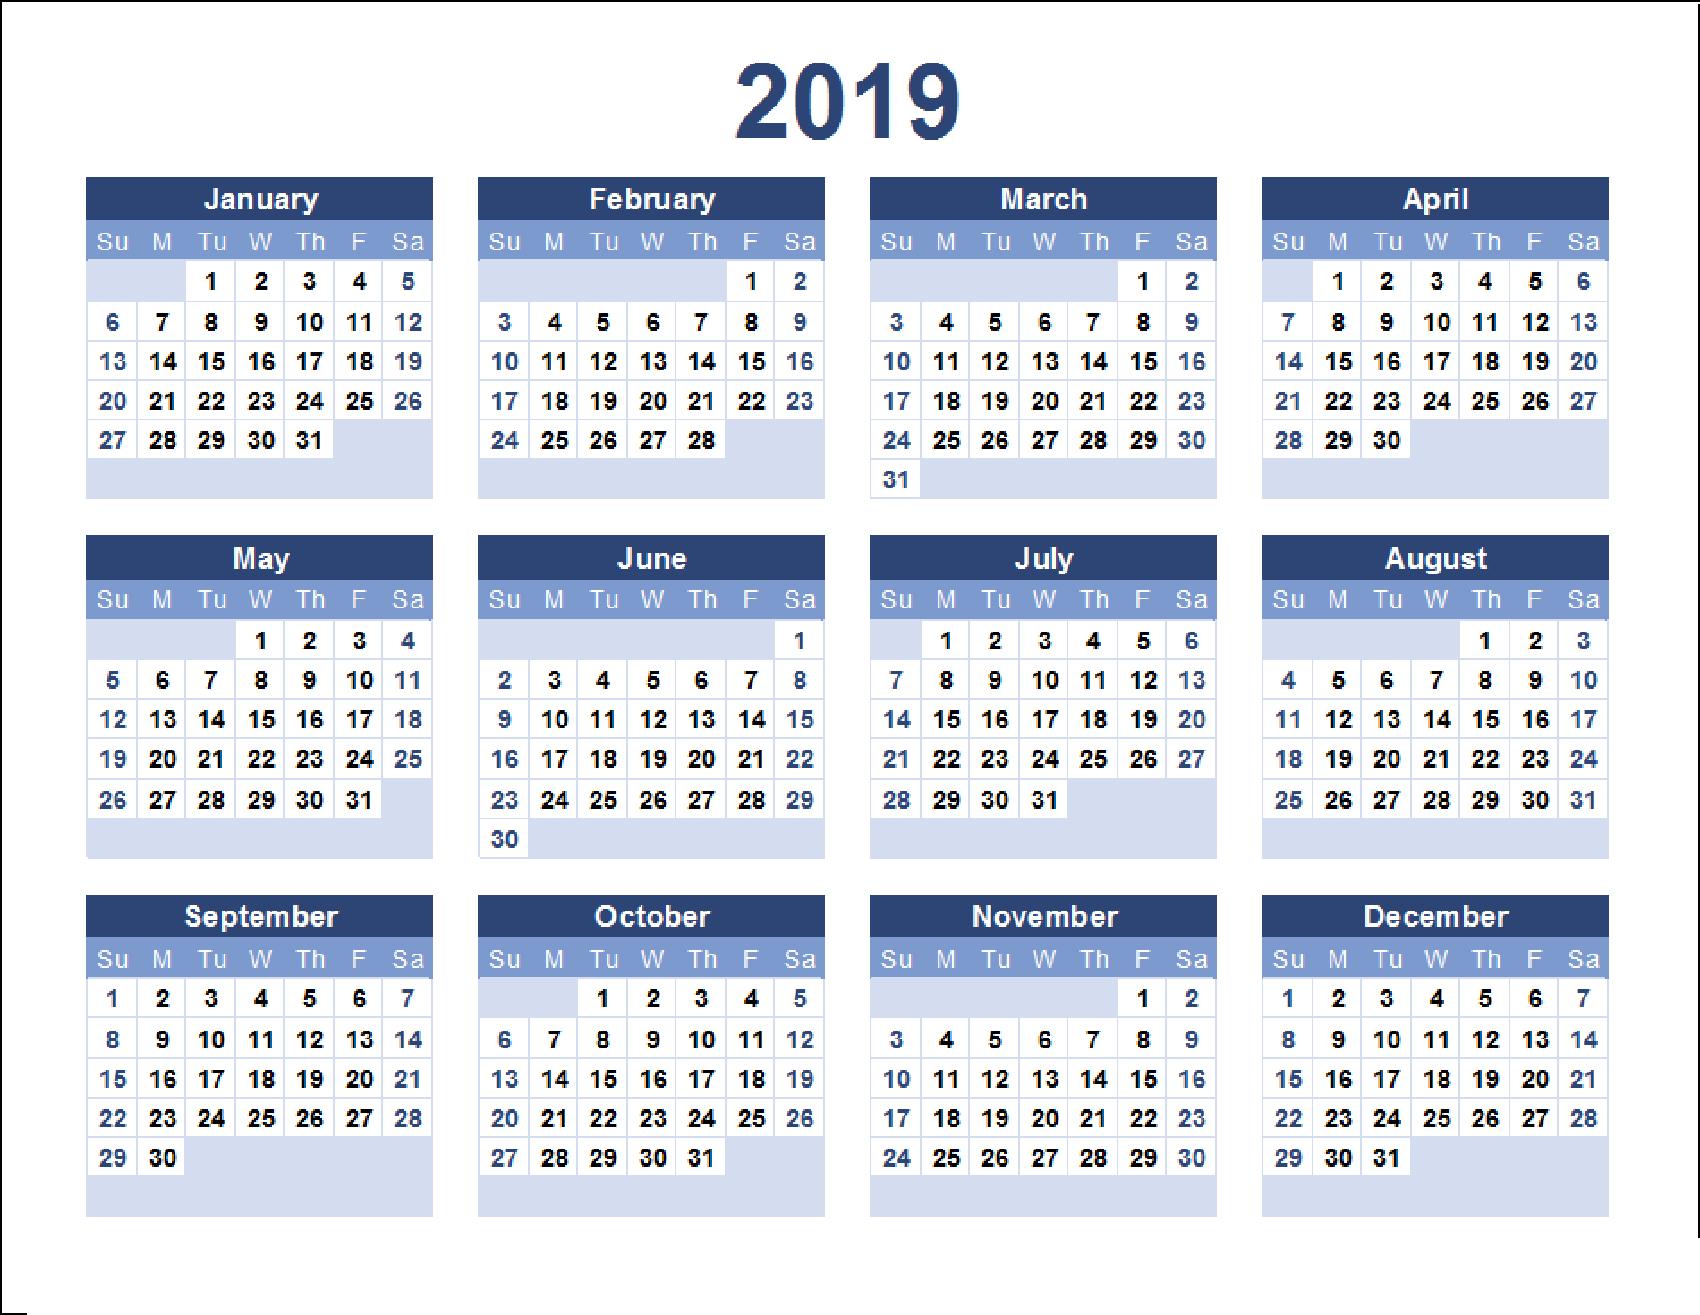 2019 Calendar Excel, Word, Pdf Templates – Printable Monthly Calendar Calendar 2019 Year Excel